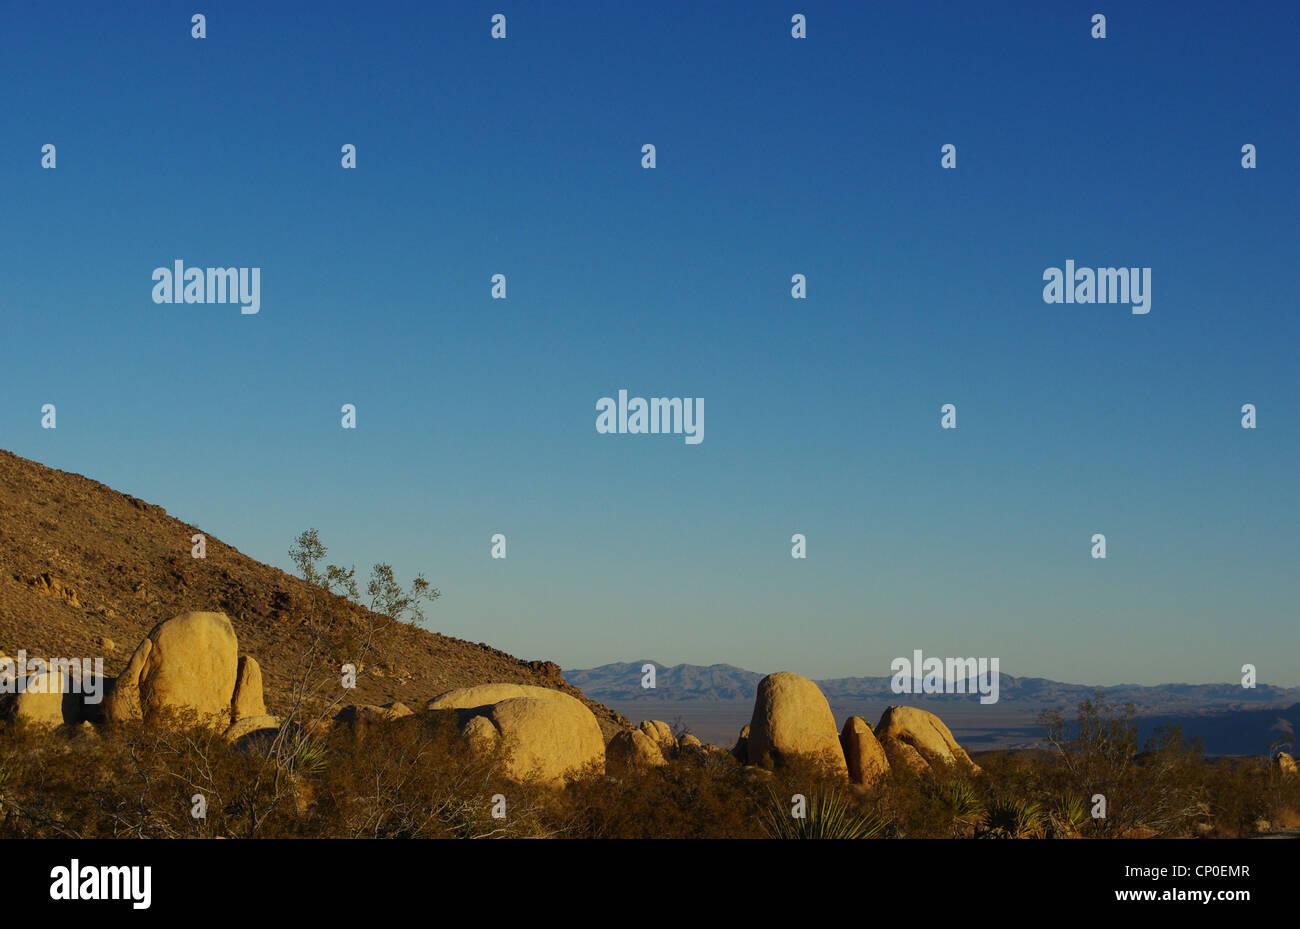 Beautiful rocks in evening light with vast desert view, Joshua Tree National Park, California - Stock Image